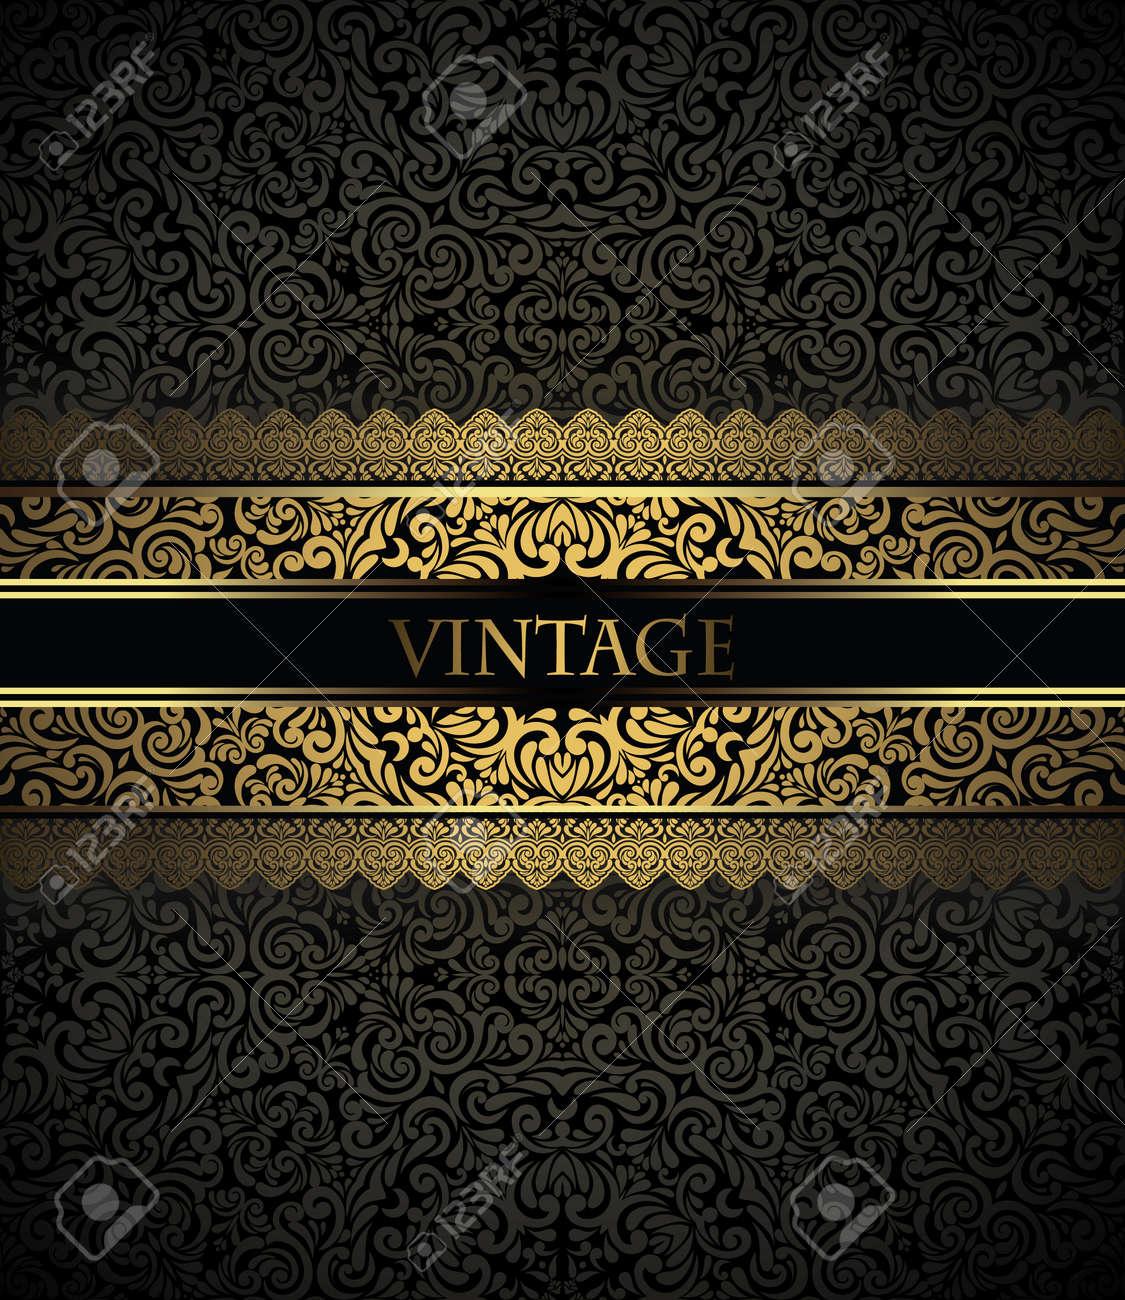 Invitation Card Baroque Golden And Black Vintage Frame Border – Invitation Card Border Design